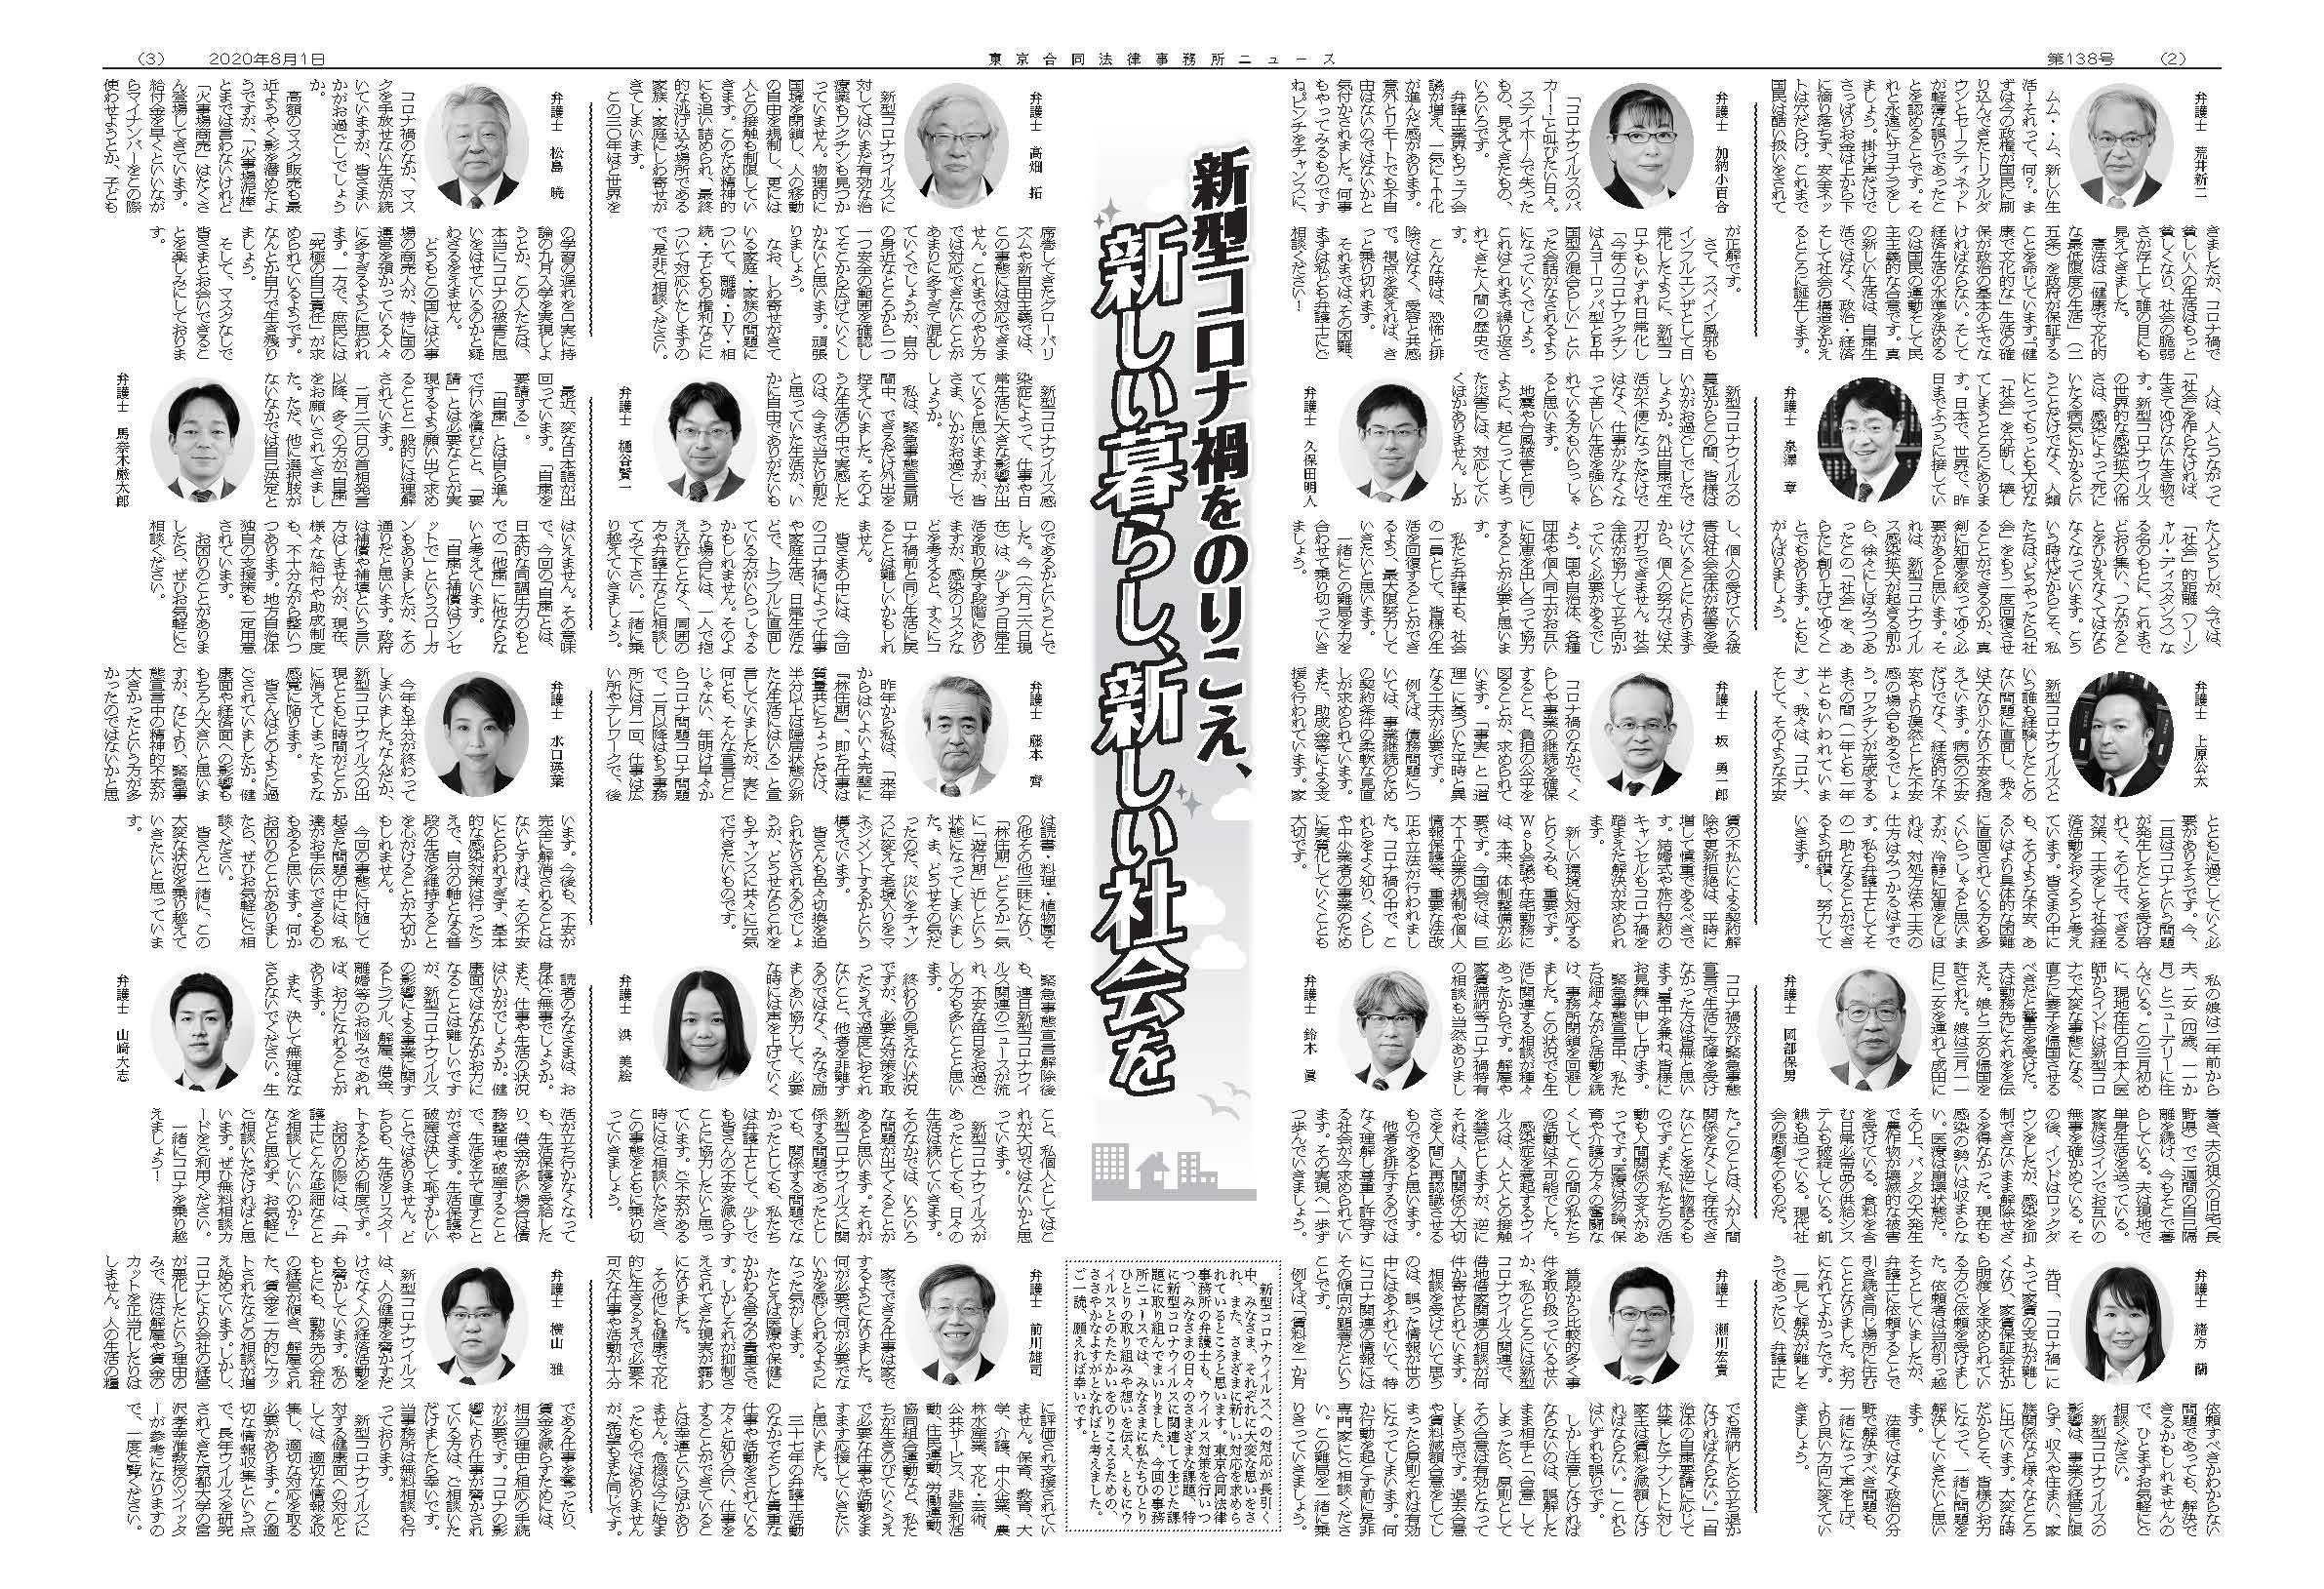 東京合同法律事務所ニュース第138号中面